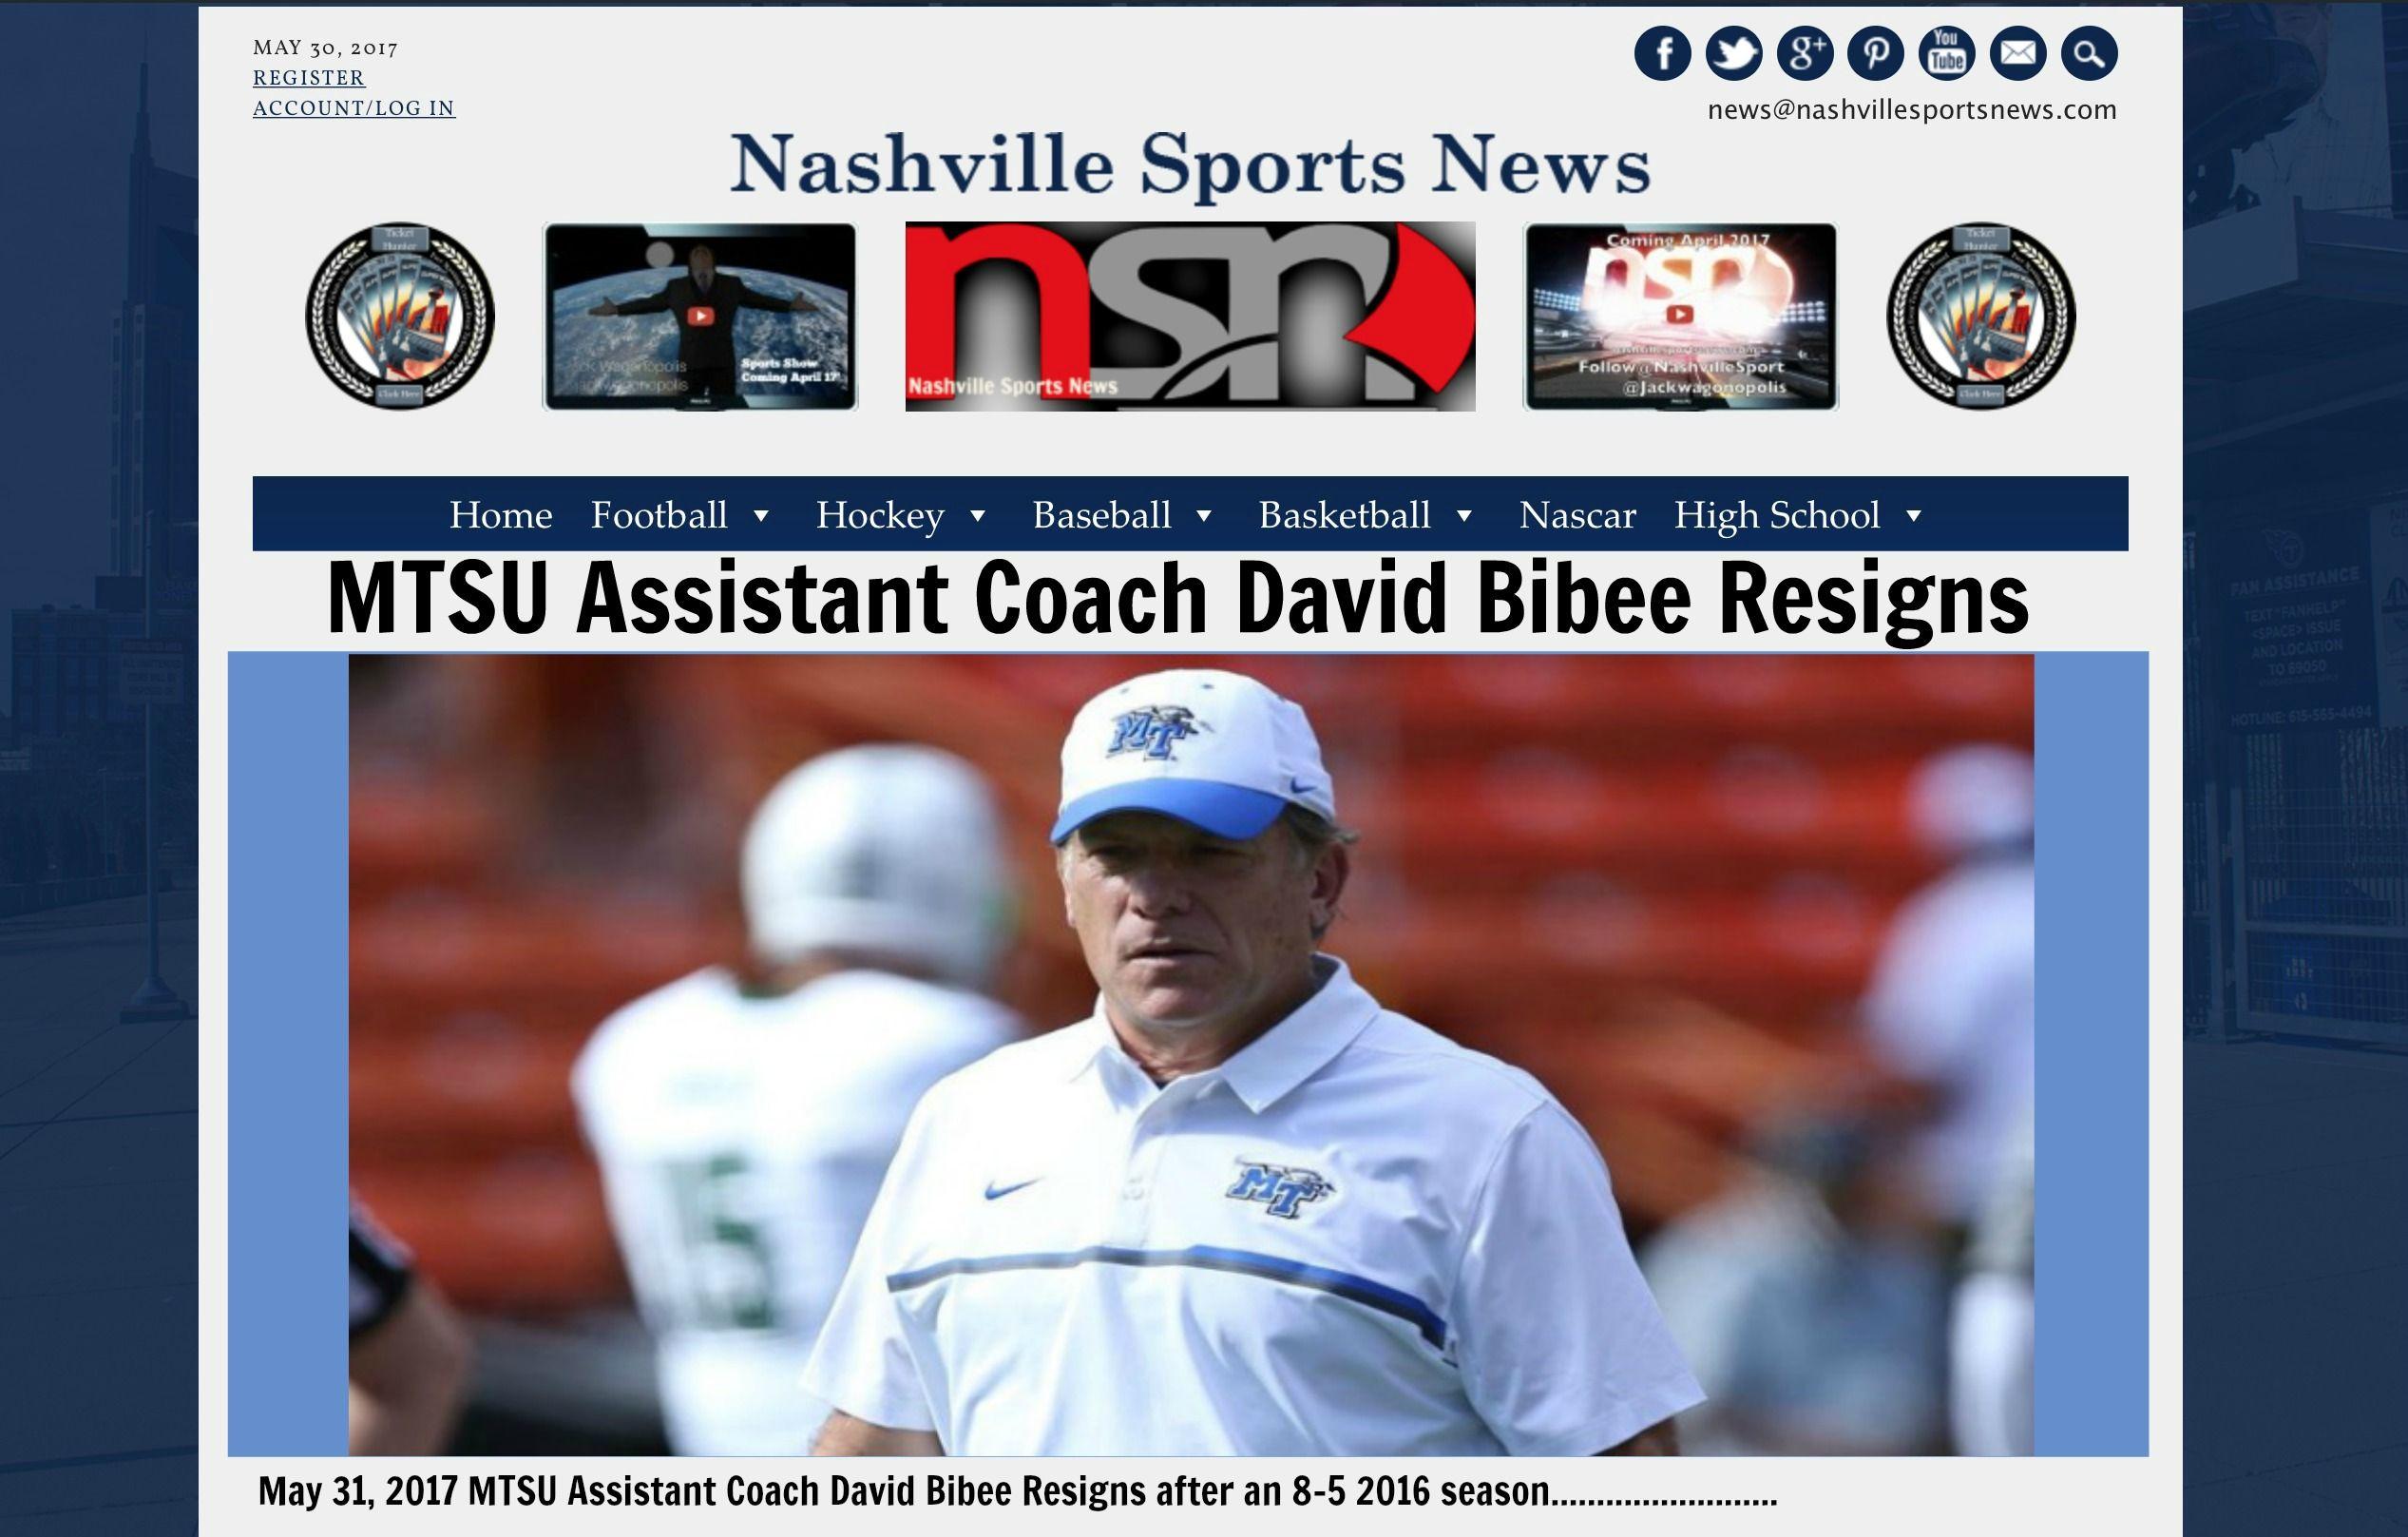 MTSU Assistant Coach David Bibee Resigns http//www